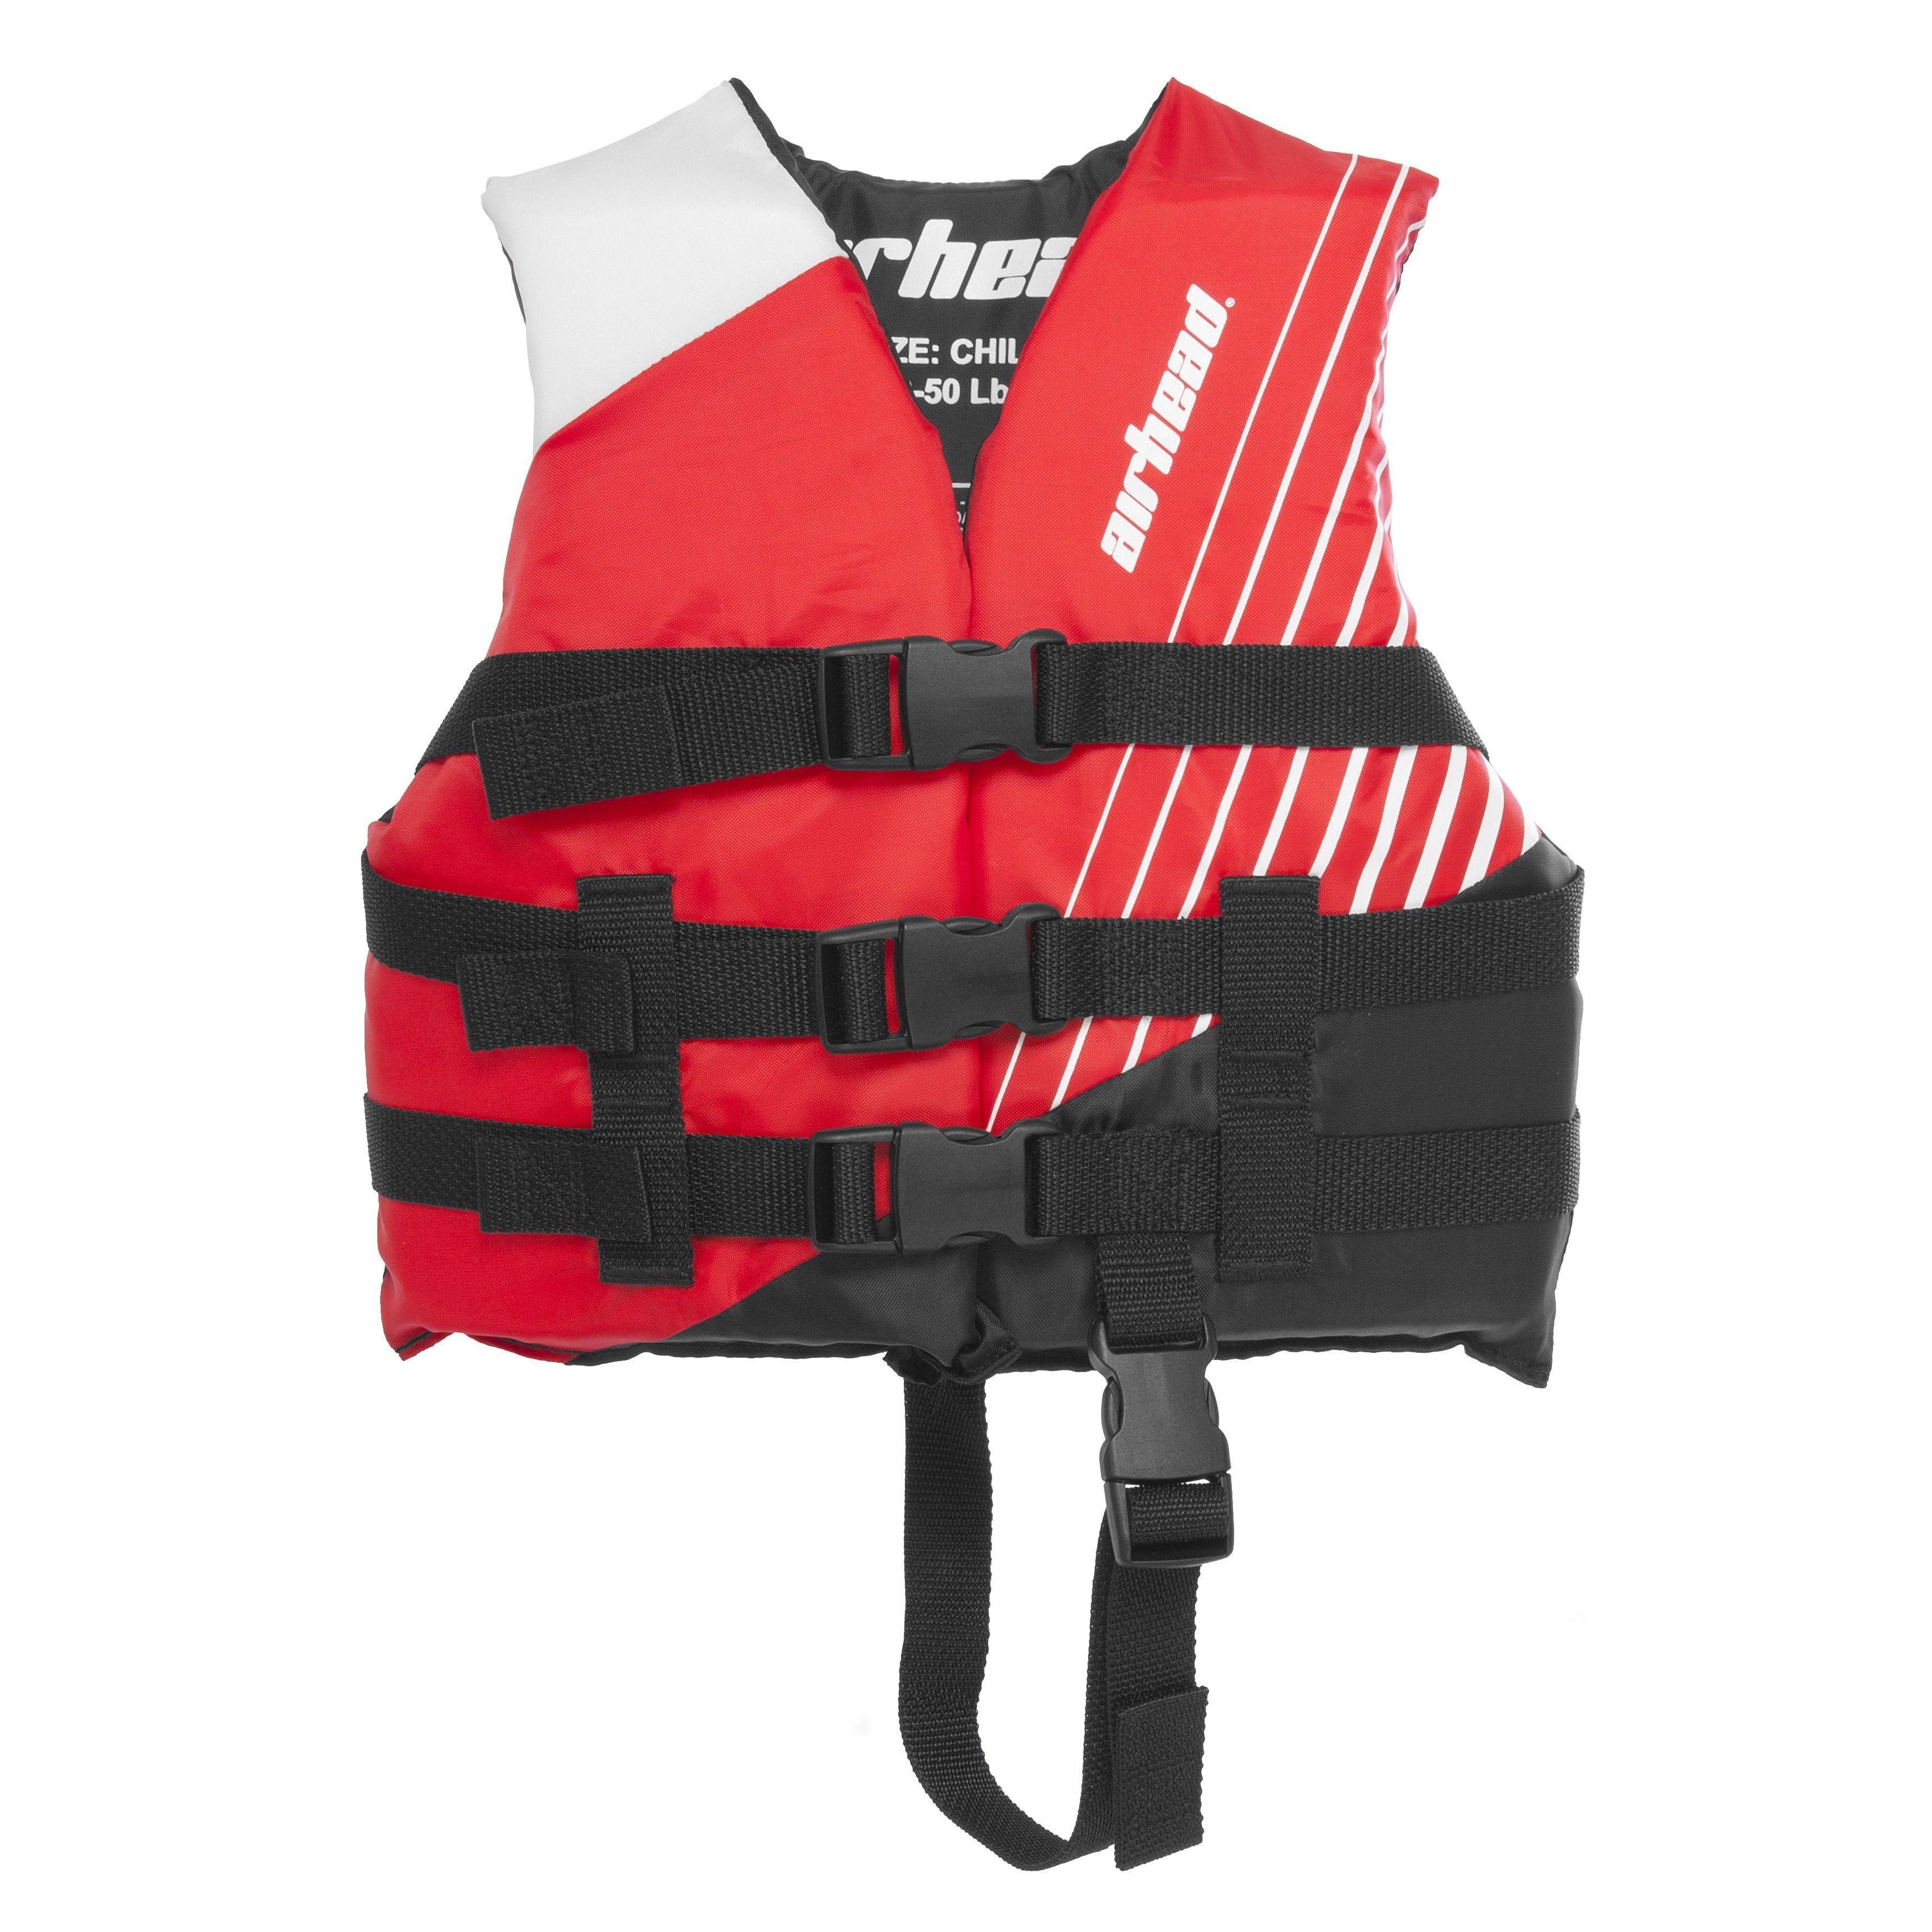 Airhead Water Safety Vest